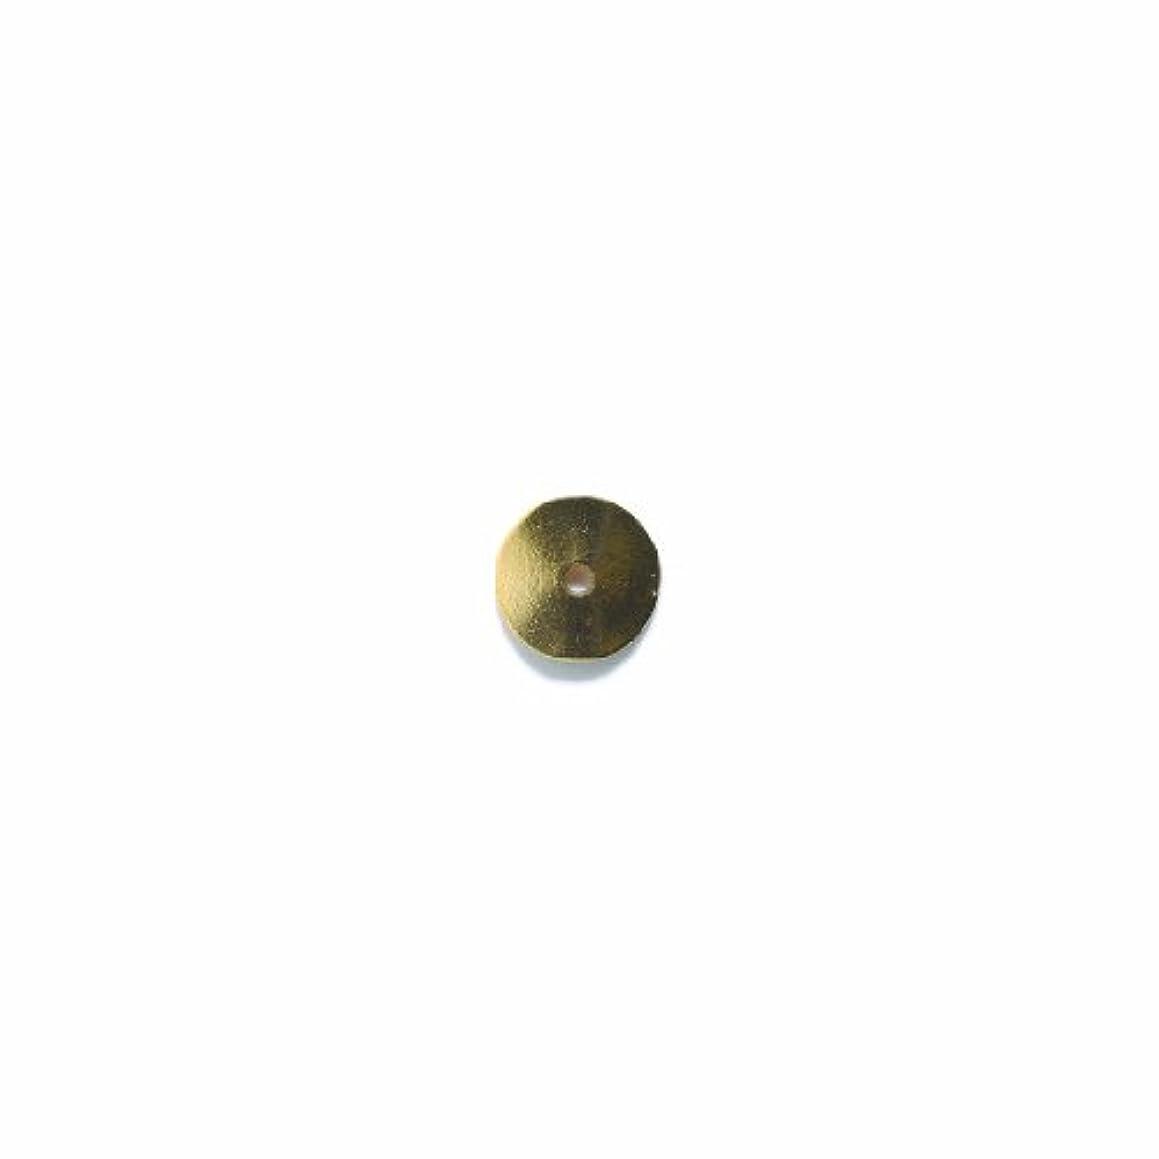 Shipwreck Beads Pewter Button Disc, Metallic, Antique Gold, 14mm, 4-Piece